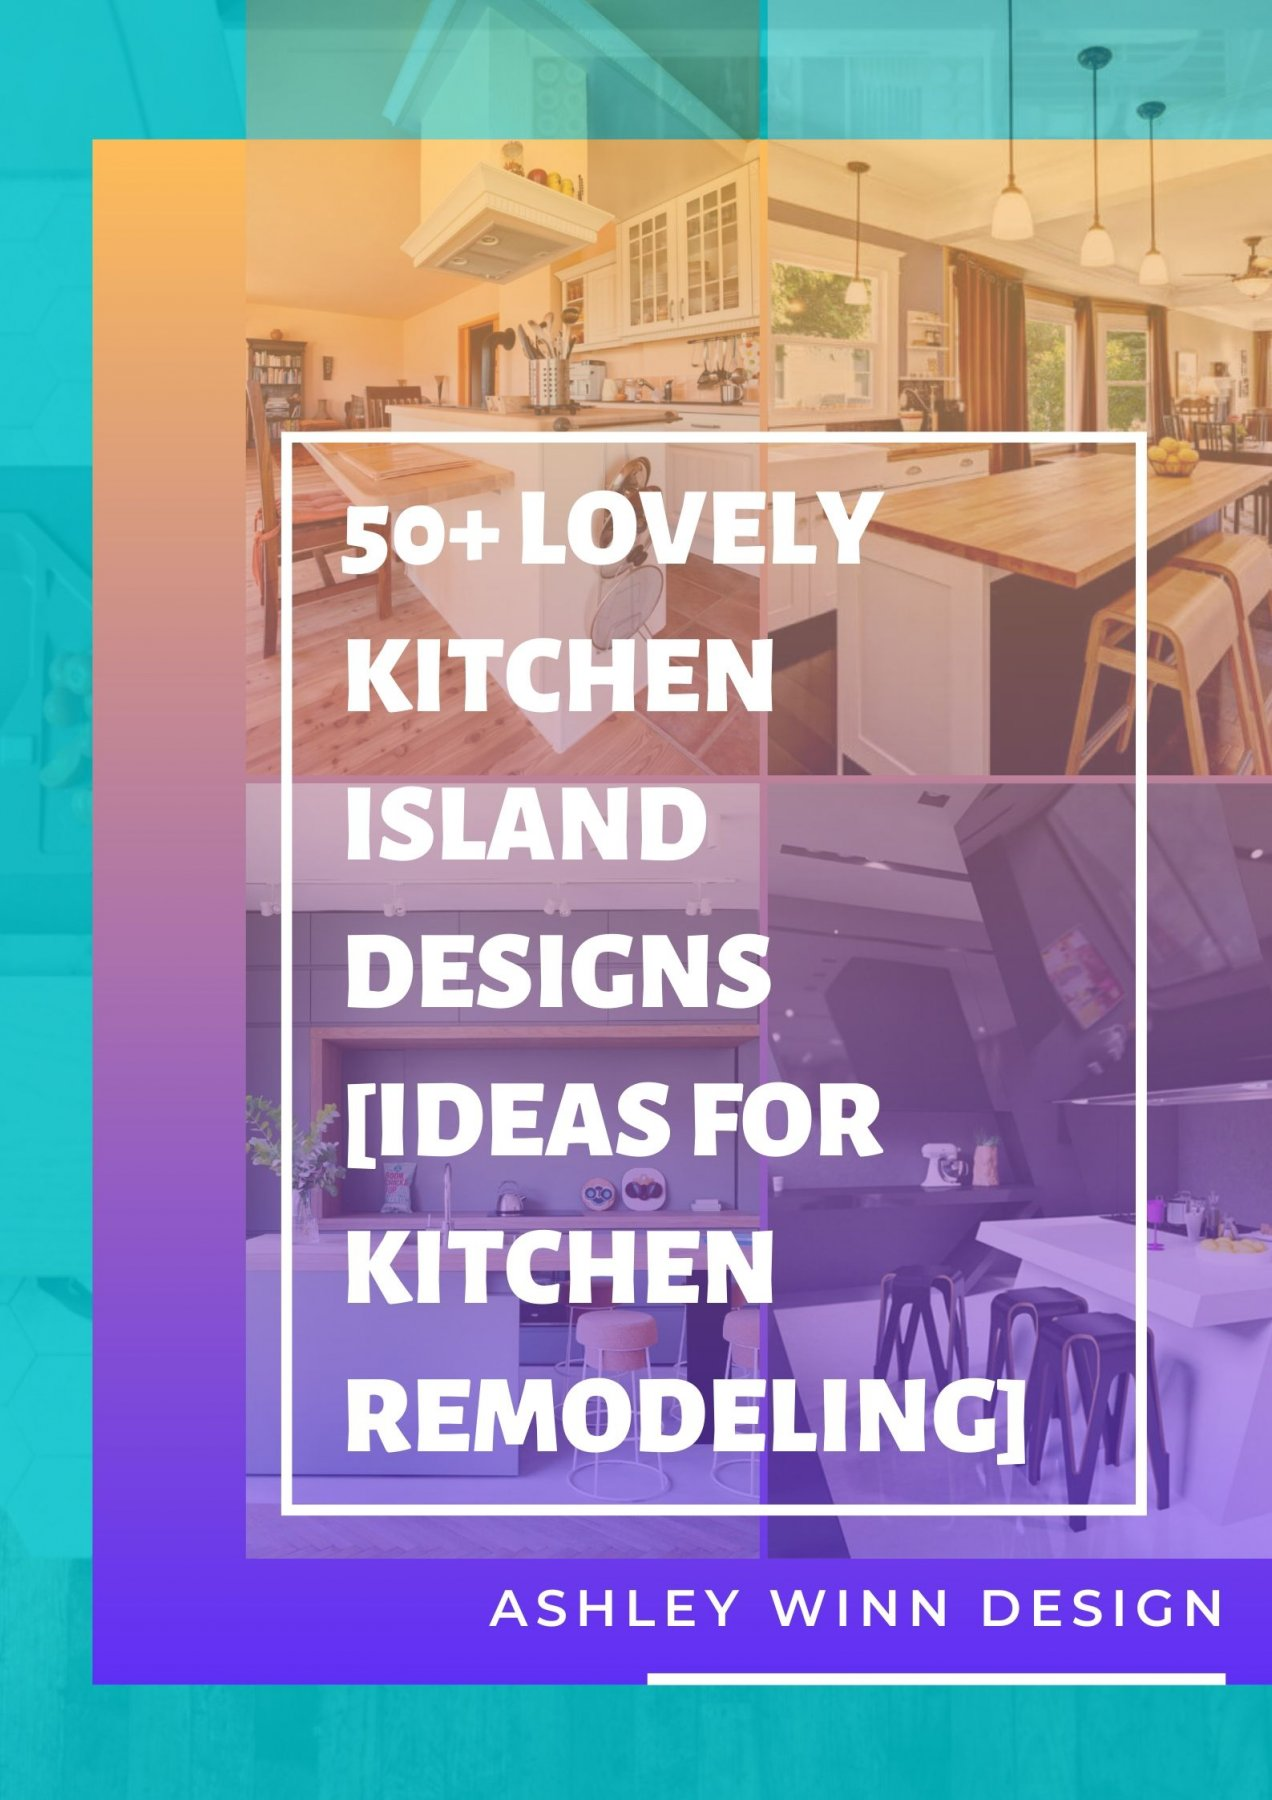 50 Lovely Kitchen Island Designs In 2021 Ideas For Kitchen Planning